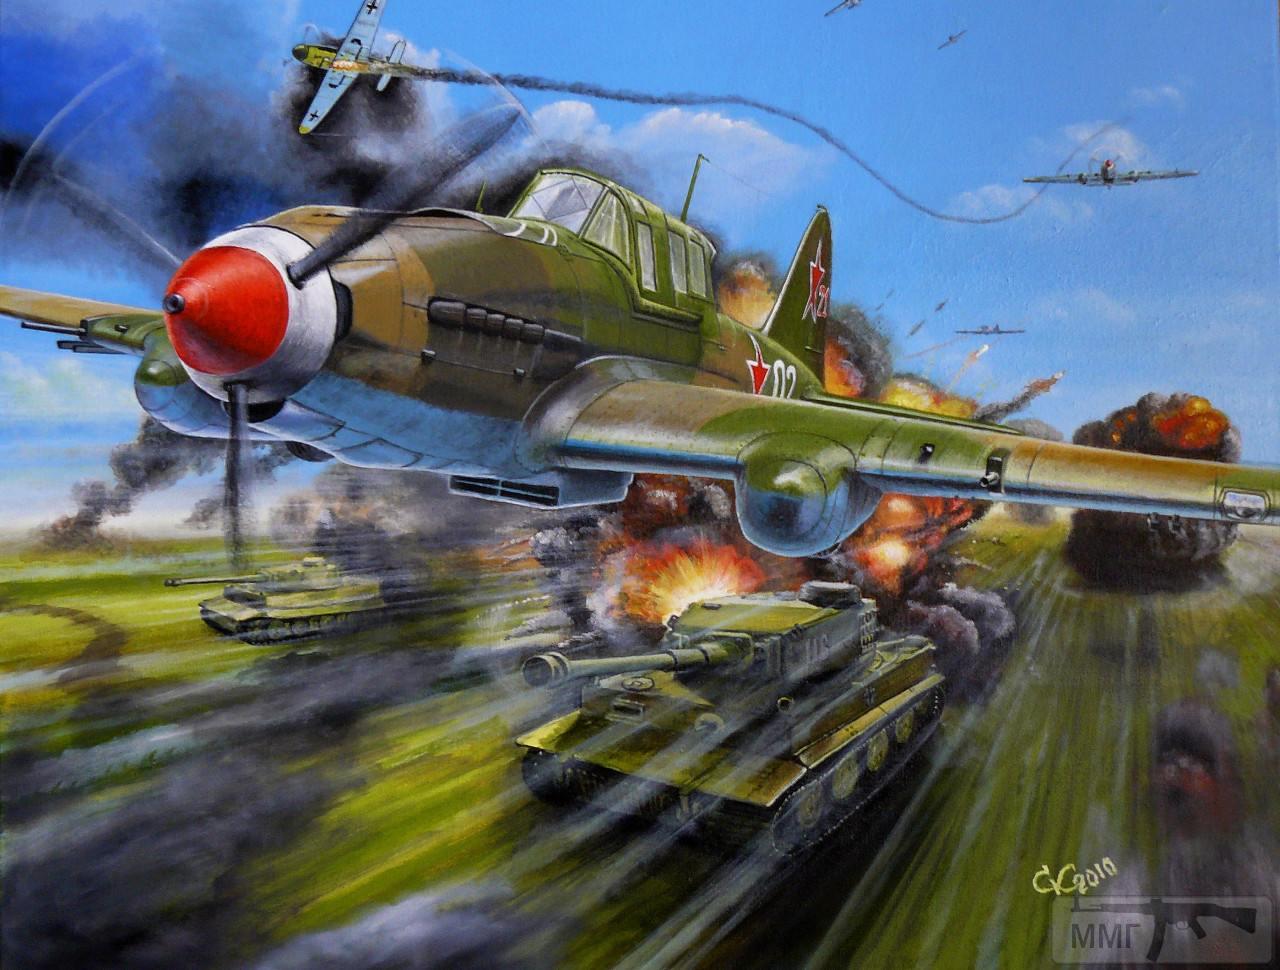 77397 - Ил-2 Курская битва.